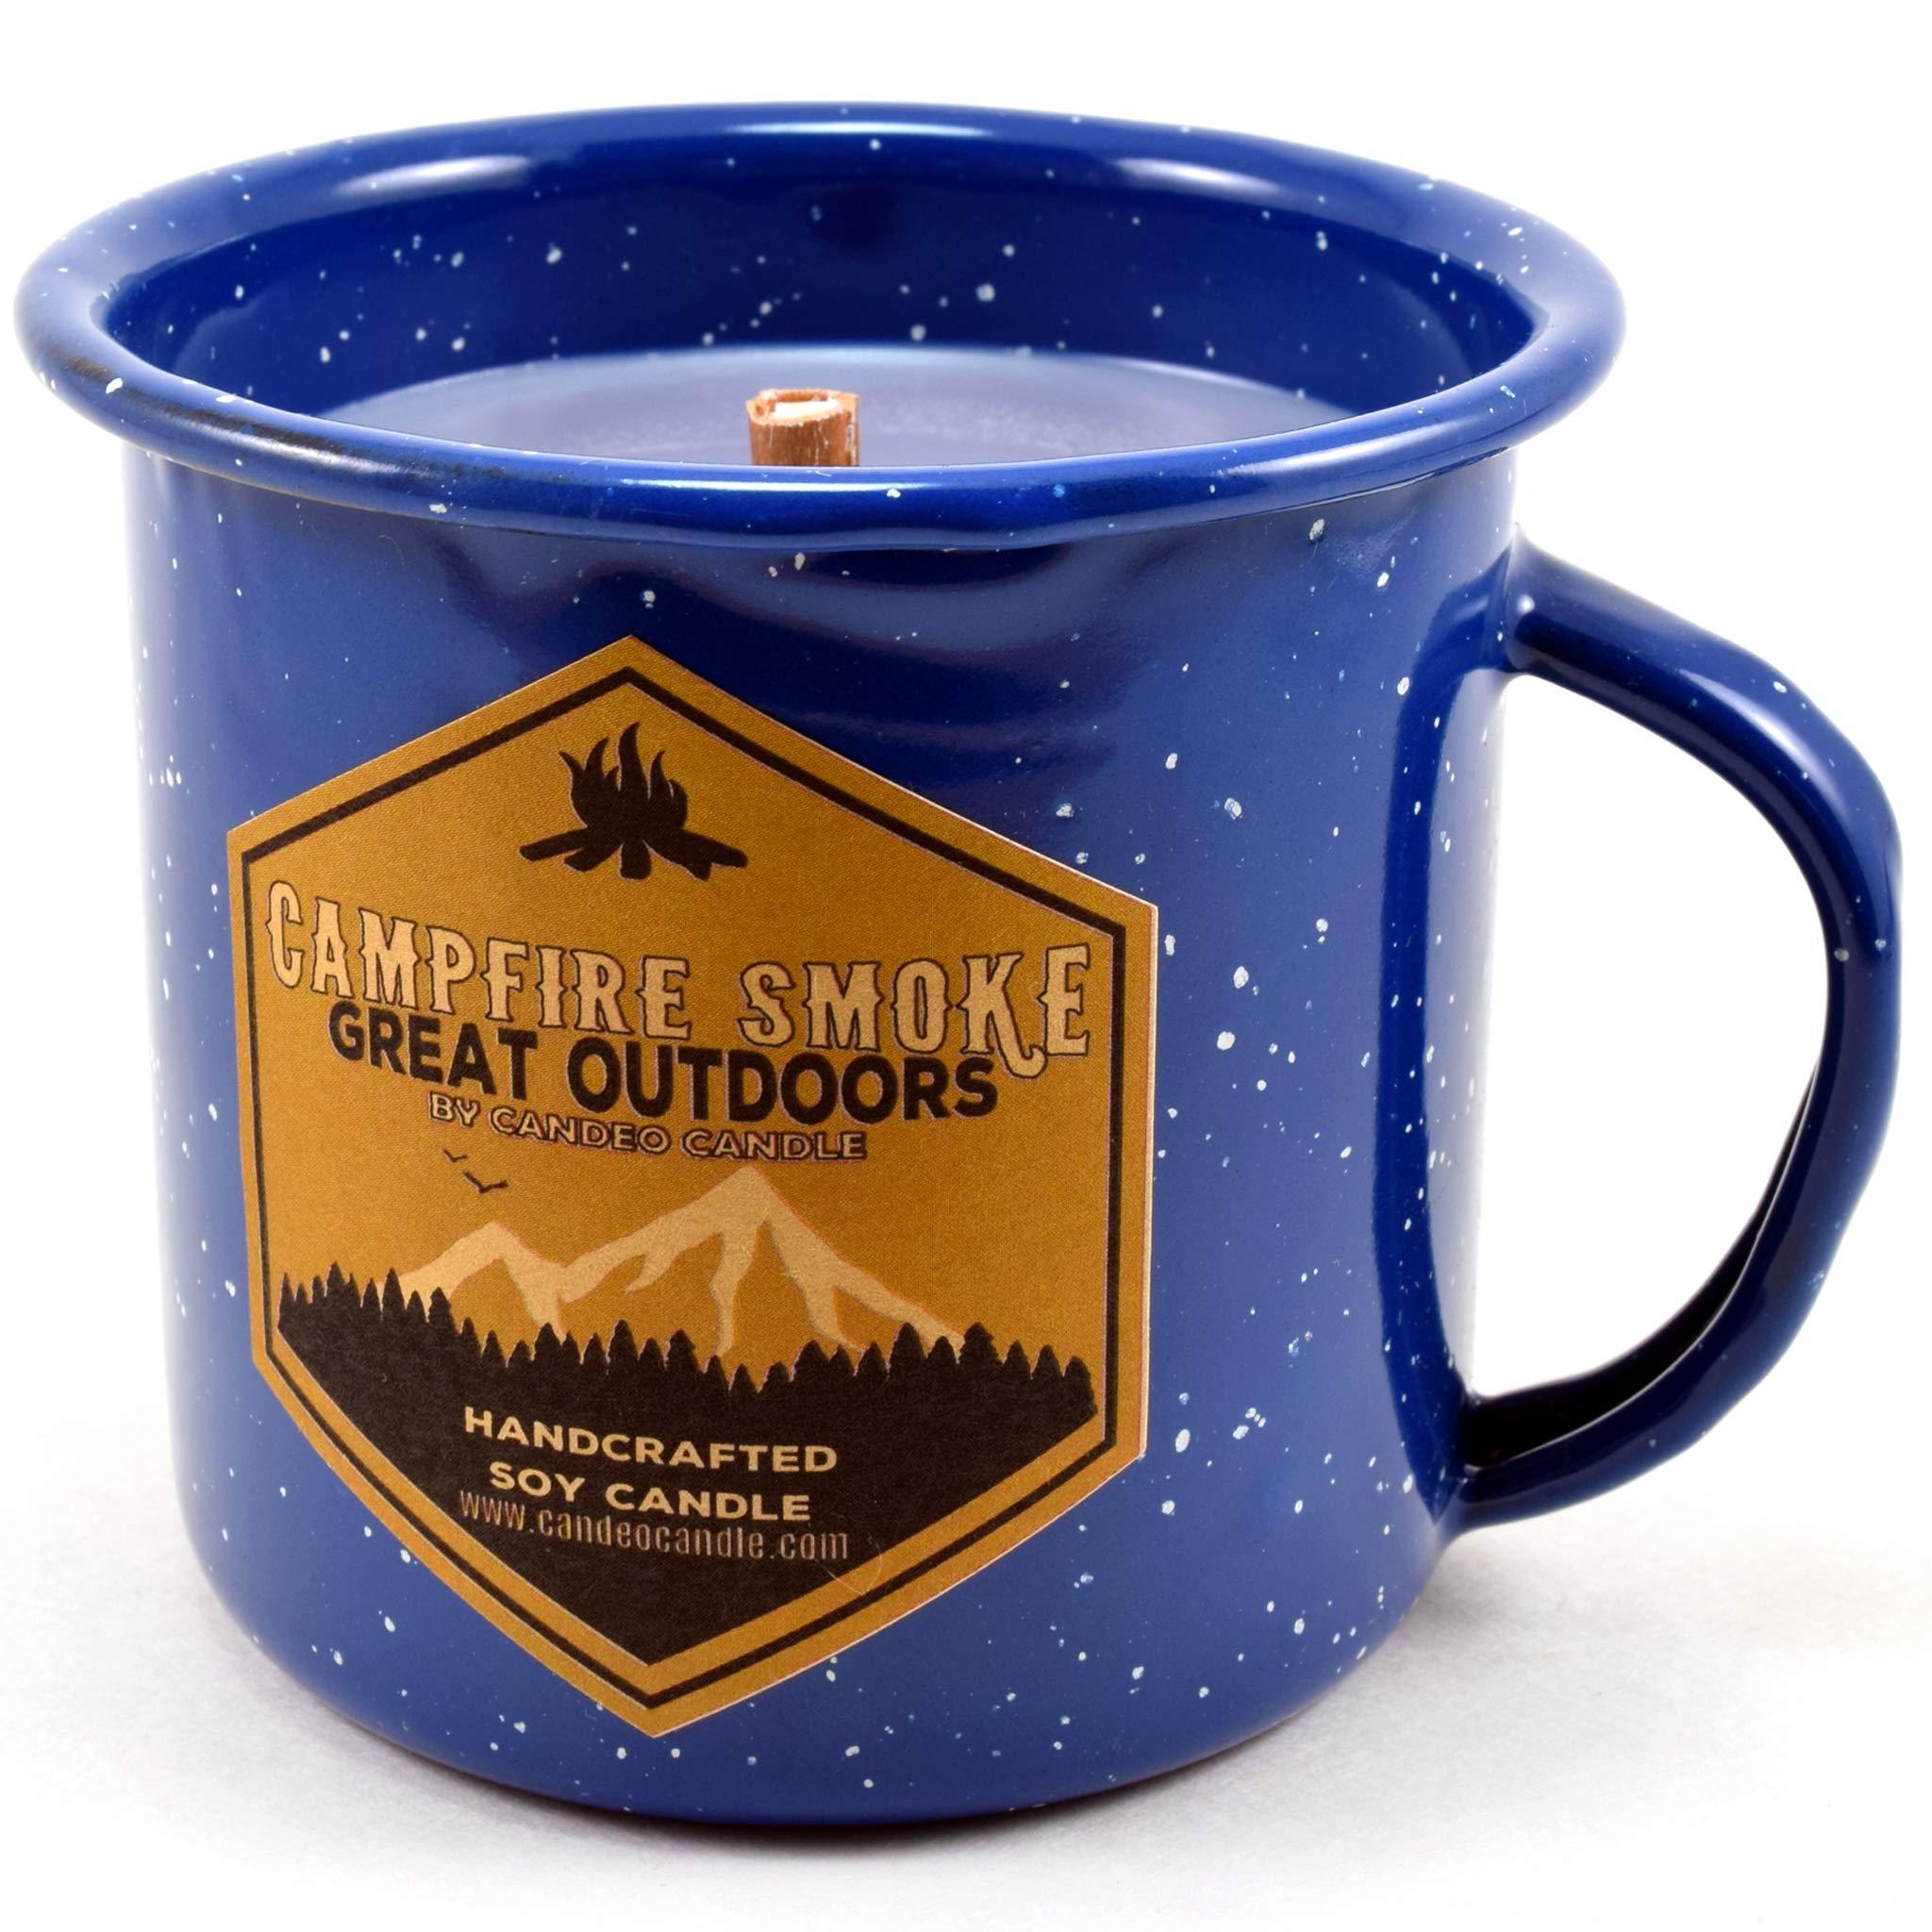 Campfire Smoke Wood Wick Soy Candle in an Enamel Camping Mug, 10 oz